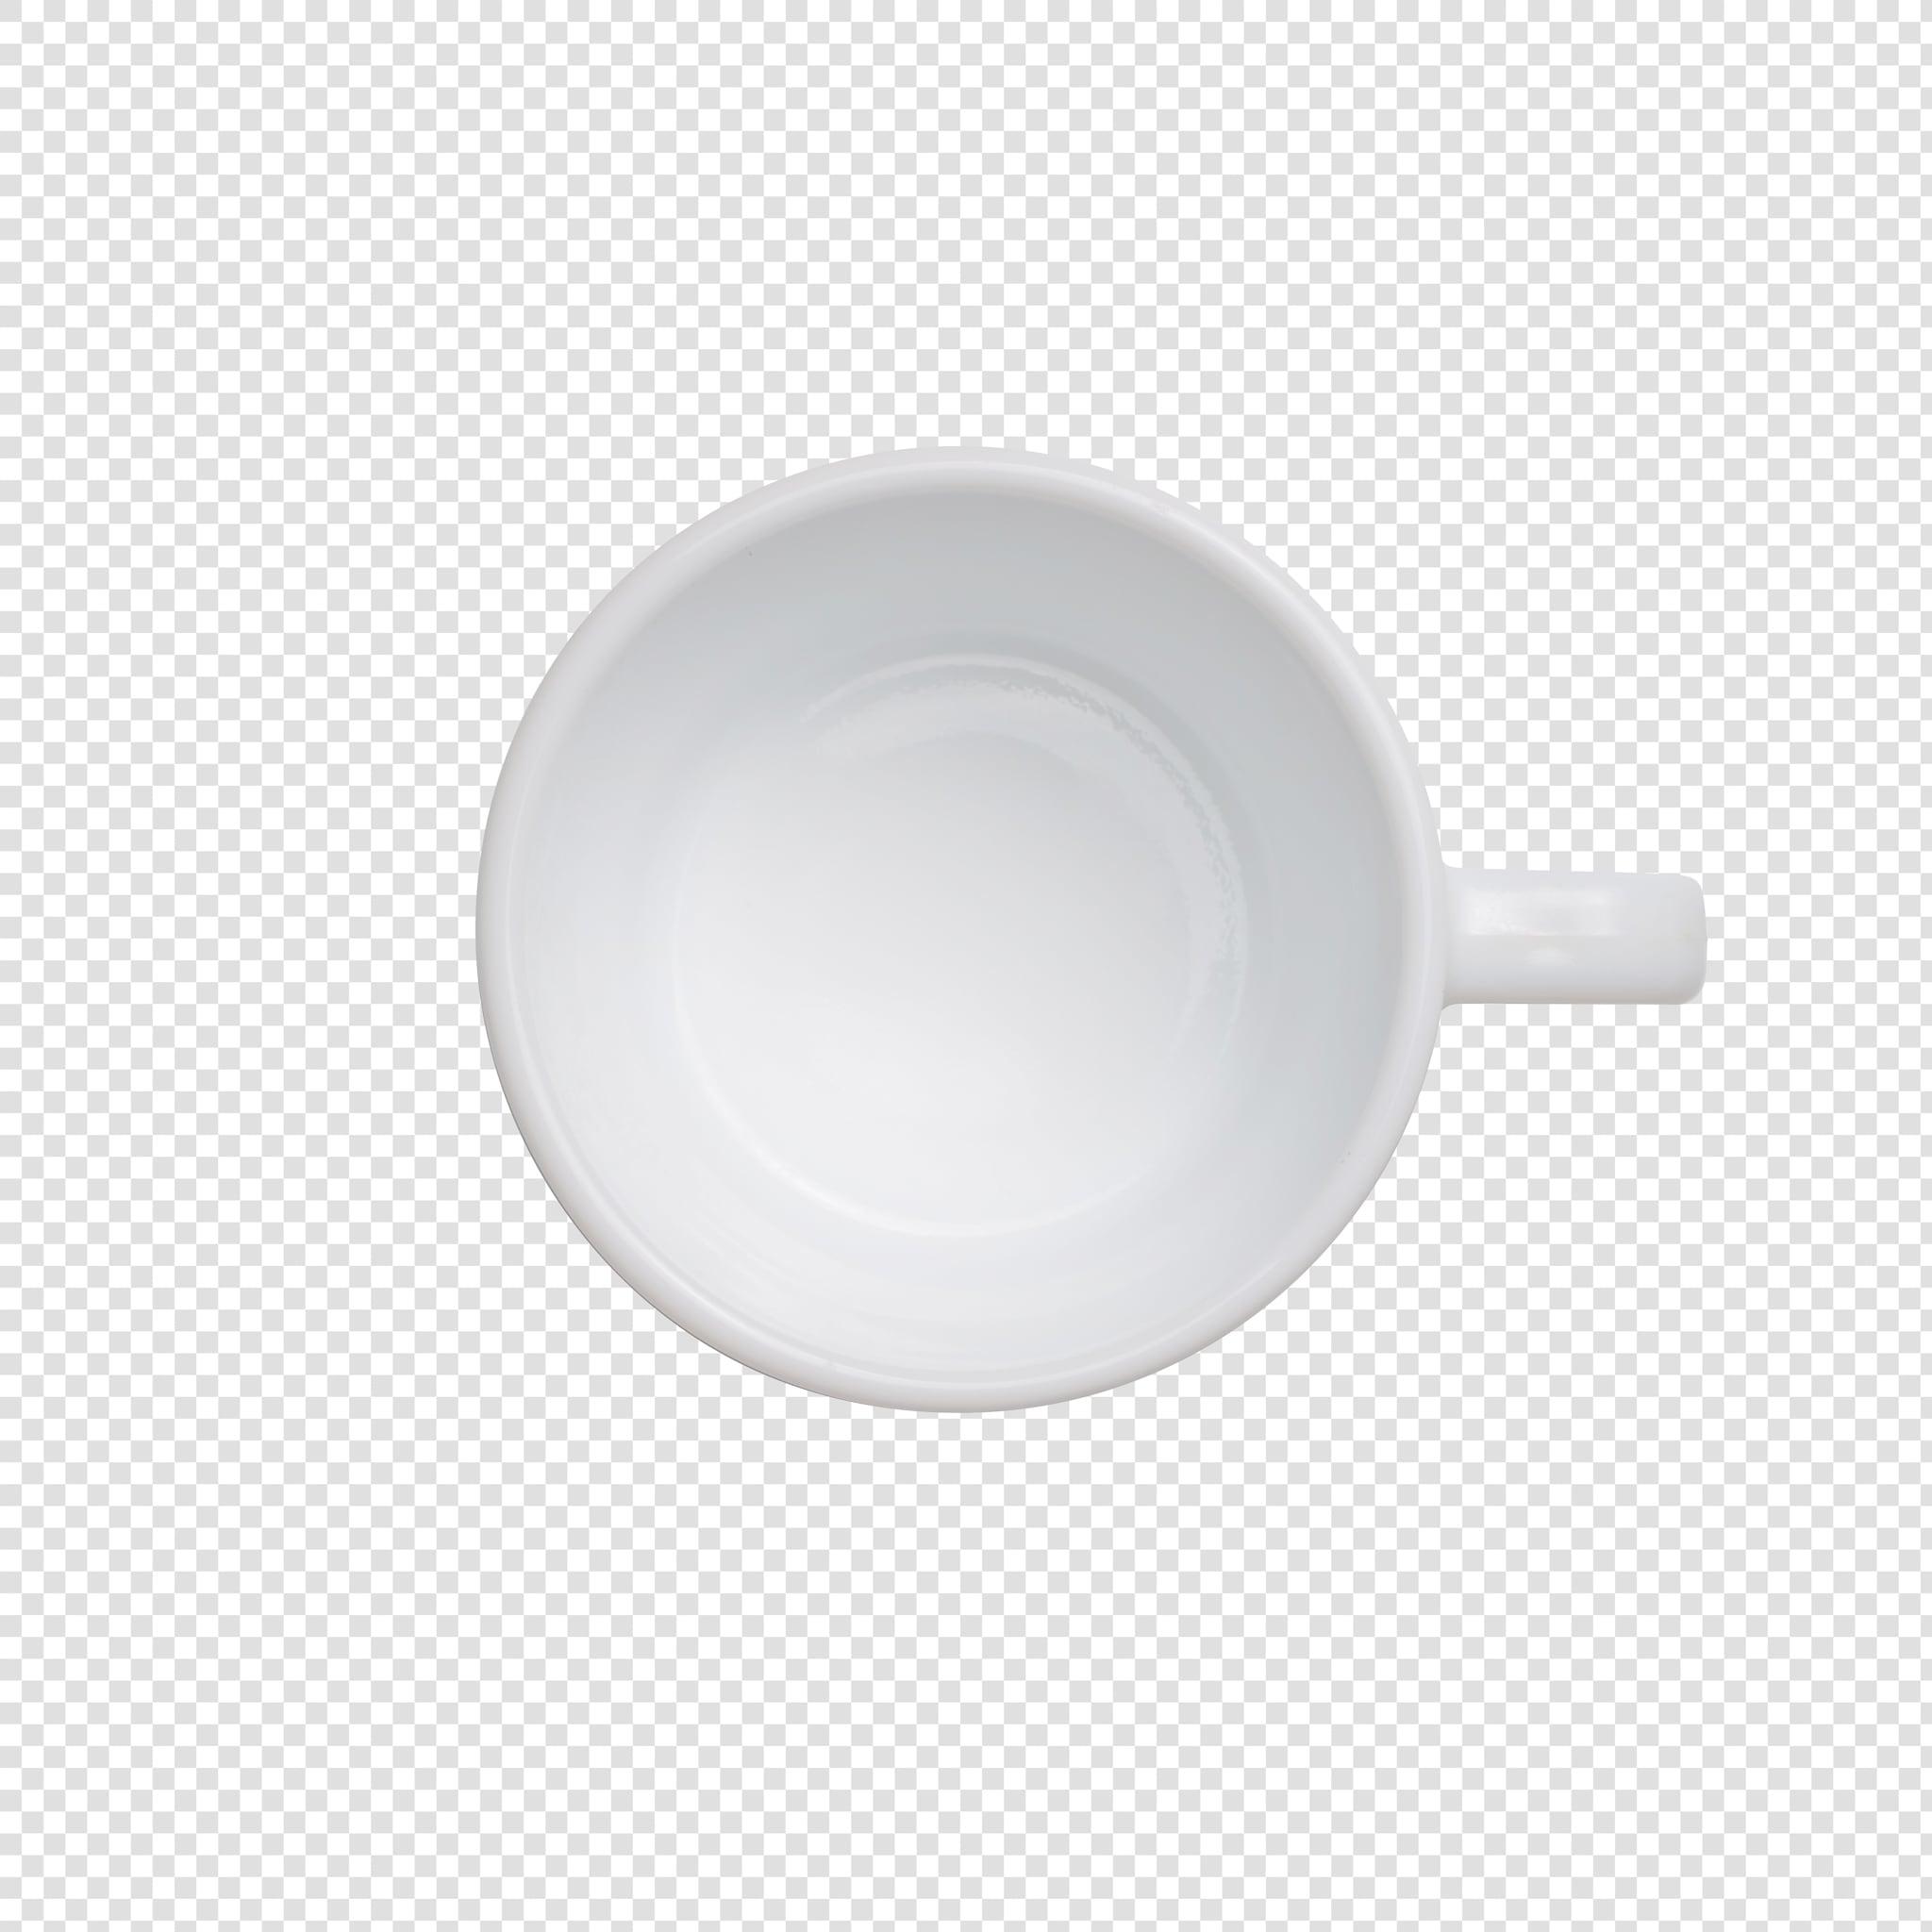 Mug image asset with transparent background